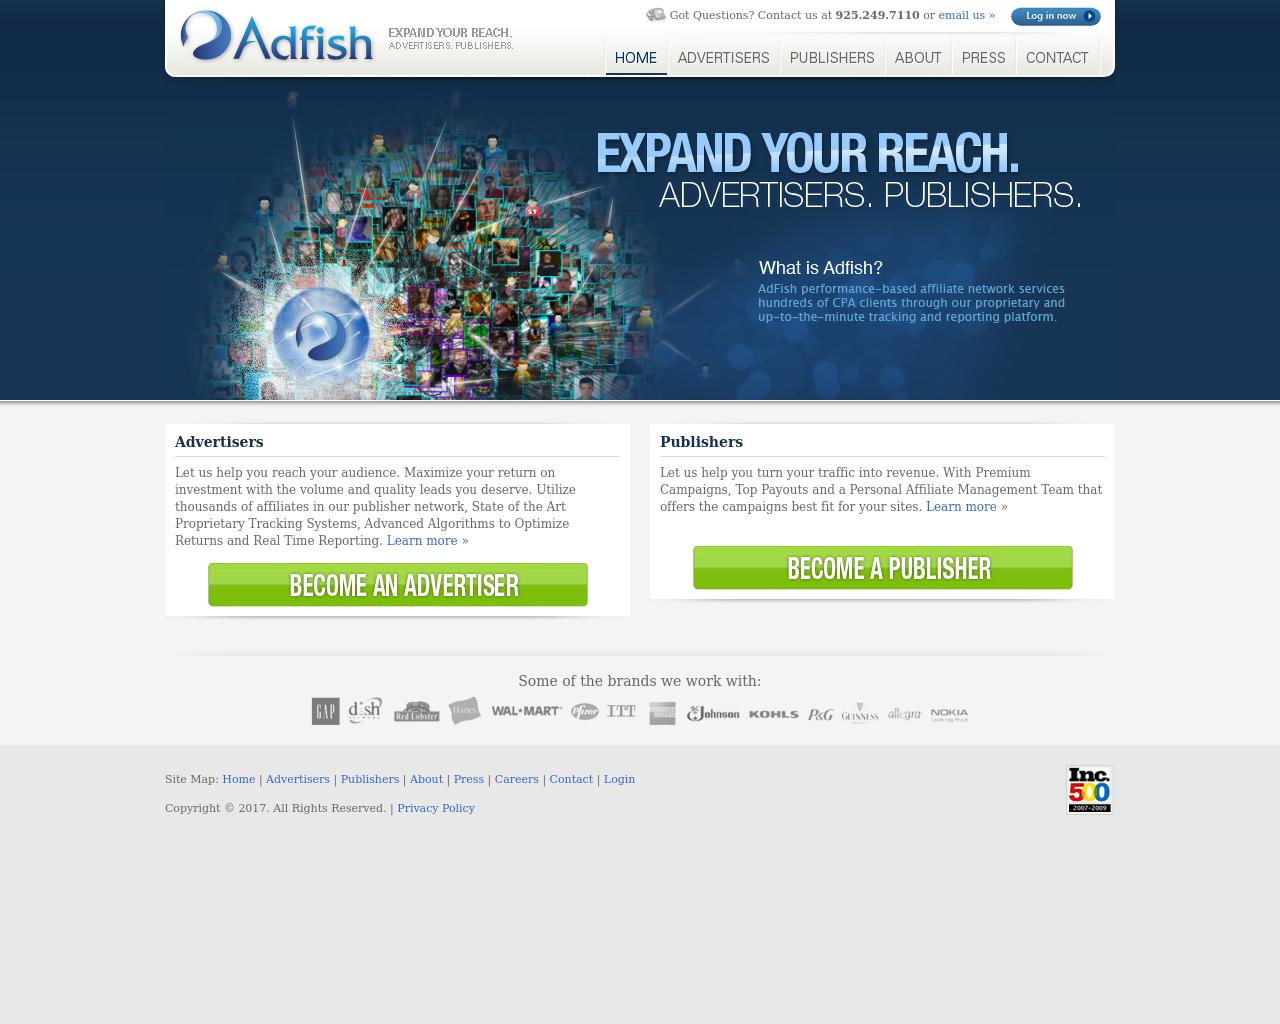 AdFish-Media-Advertising-Reviews-Pricing